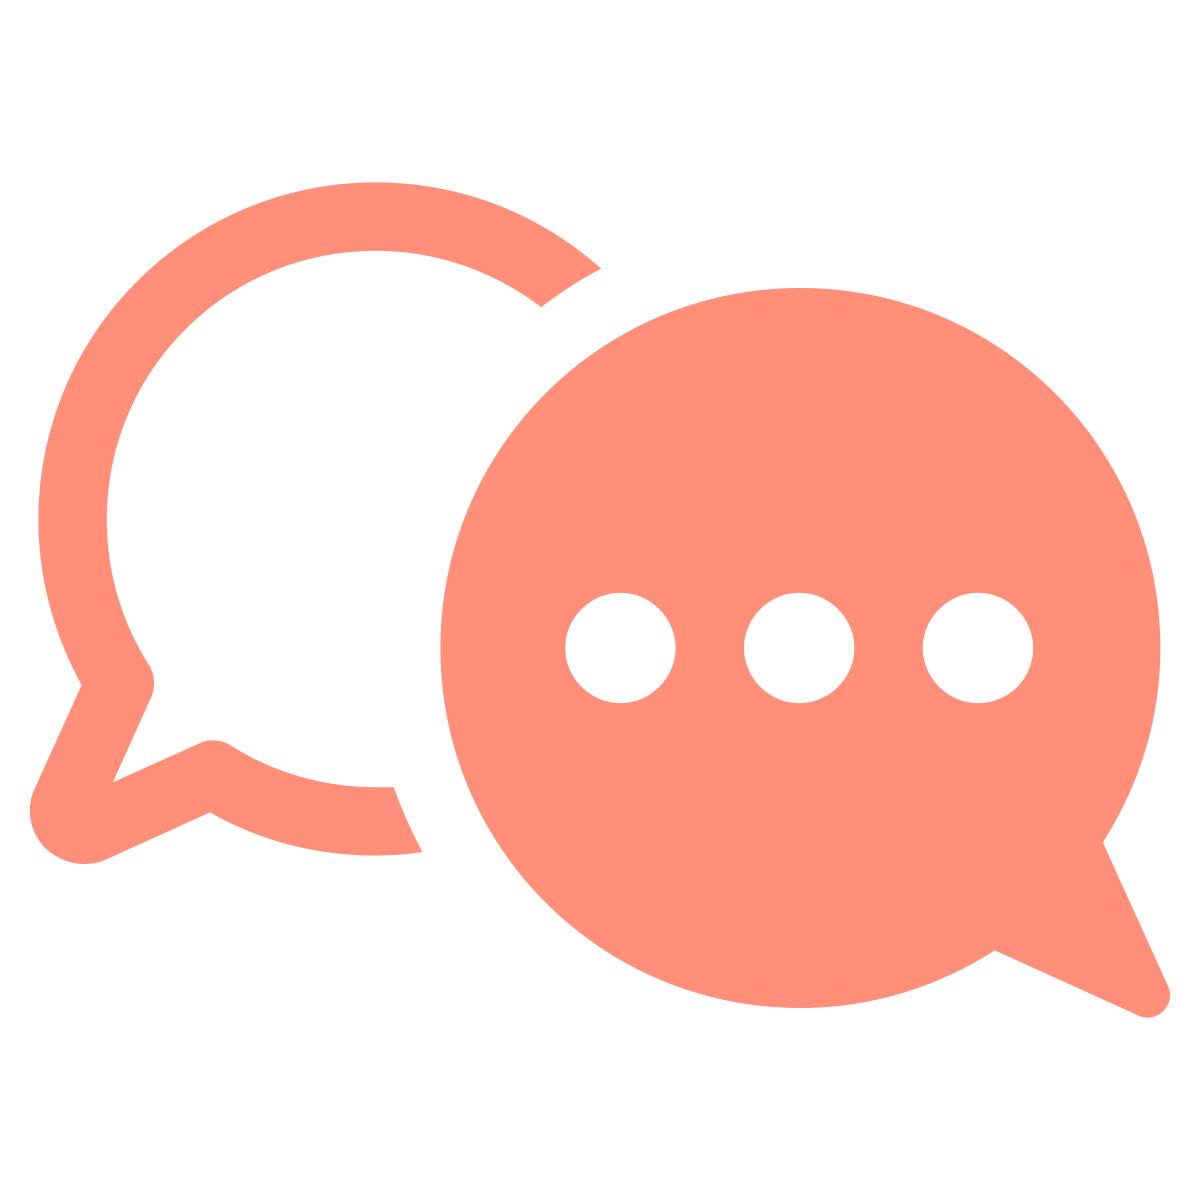 noun_Communication_1970166_ff8f79